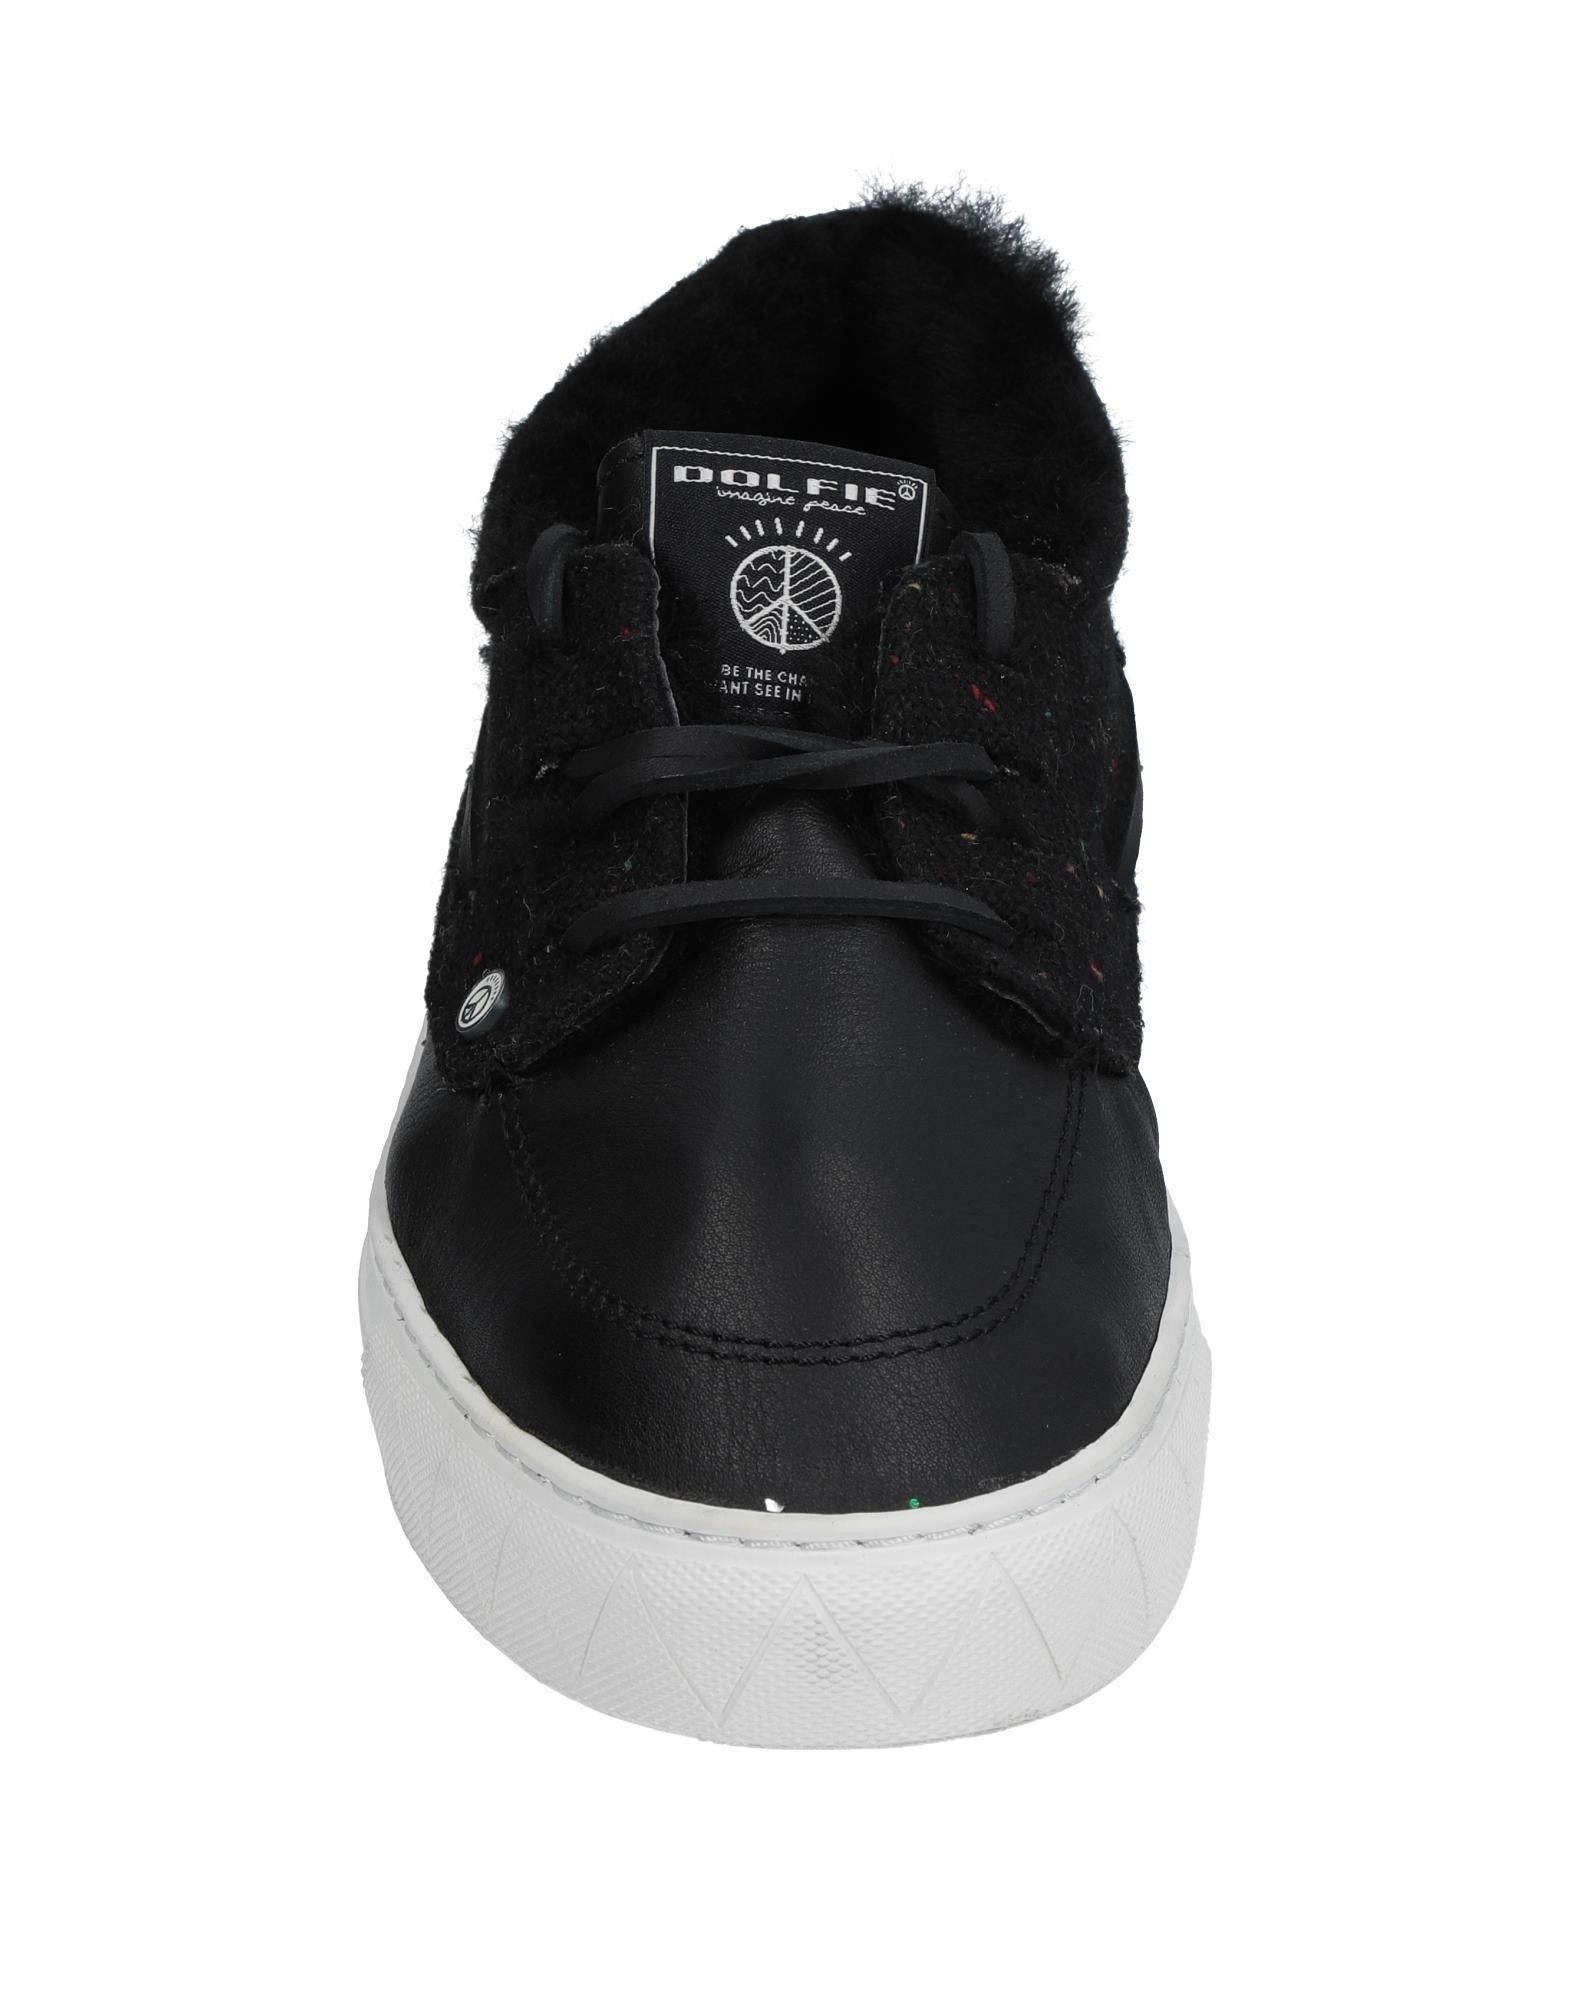 Dolfie Loafers - - - Men Dolfie Loafers online on  Canada - 11527899UO 91e5de